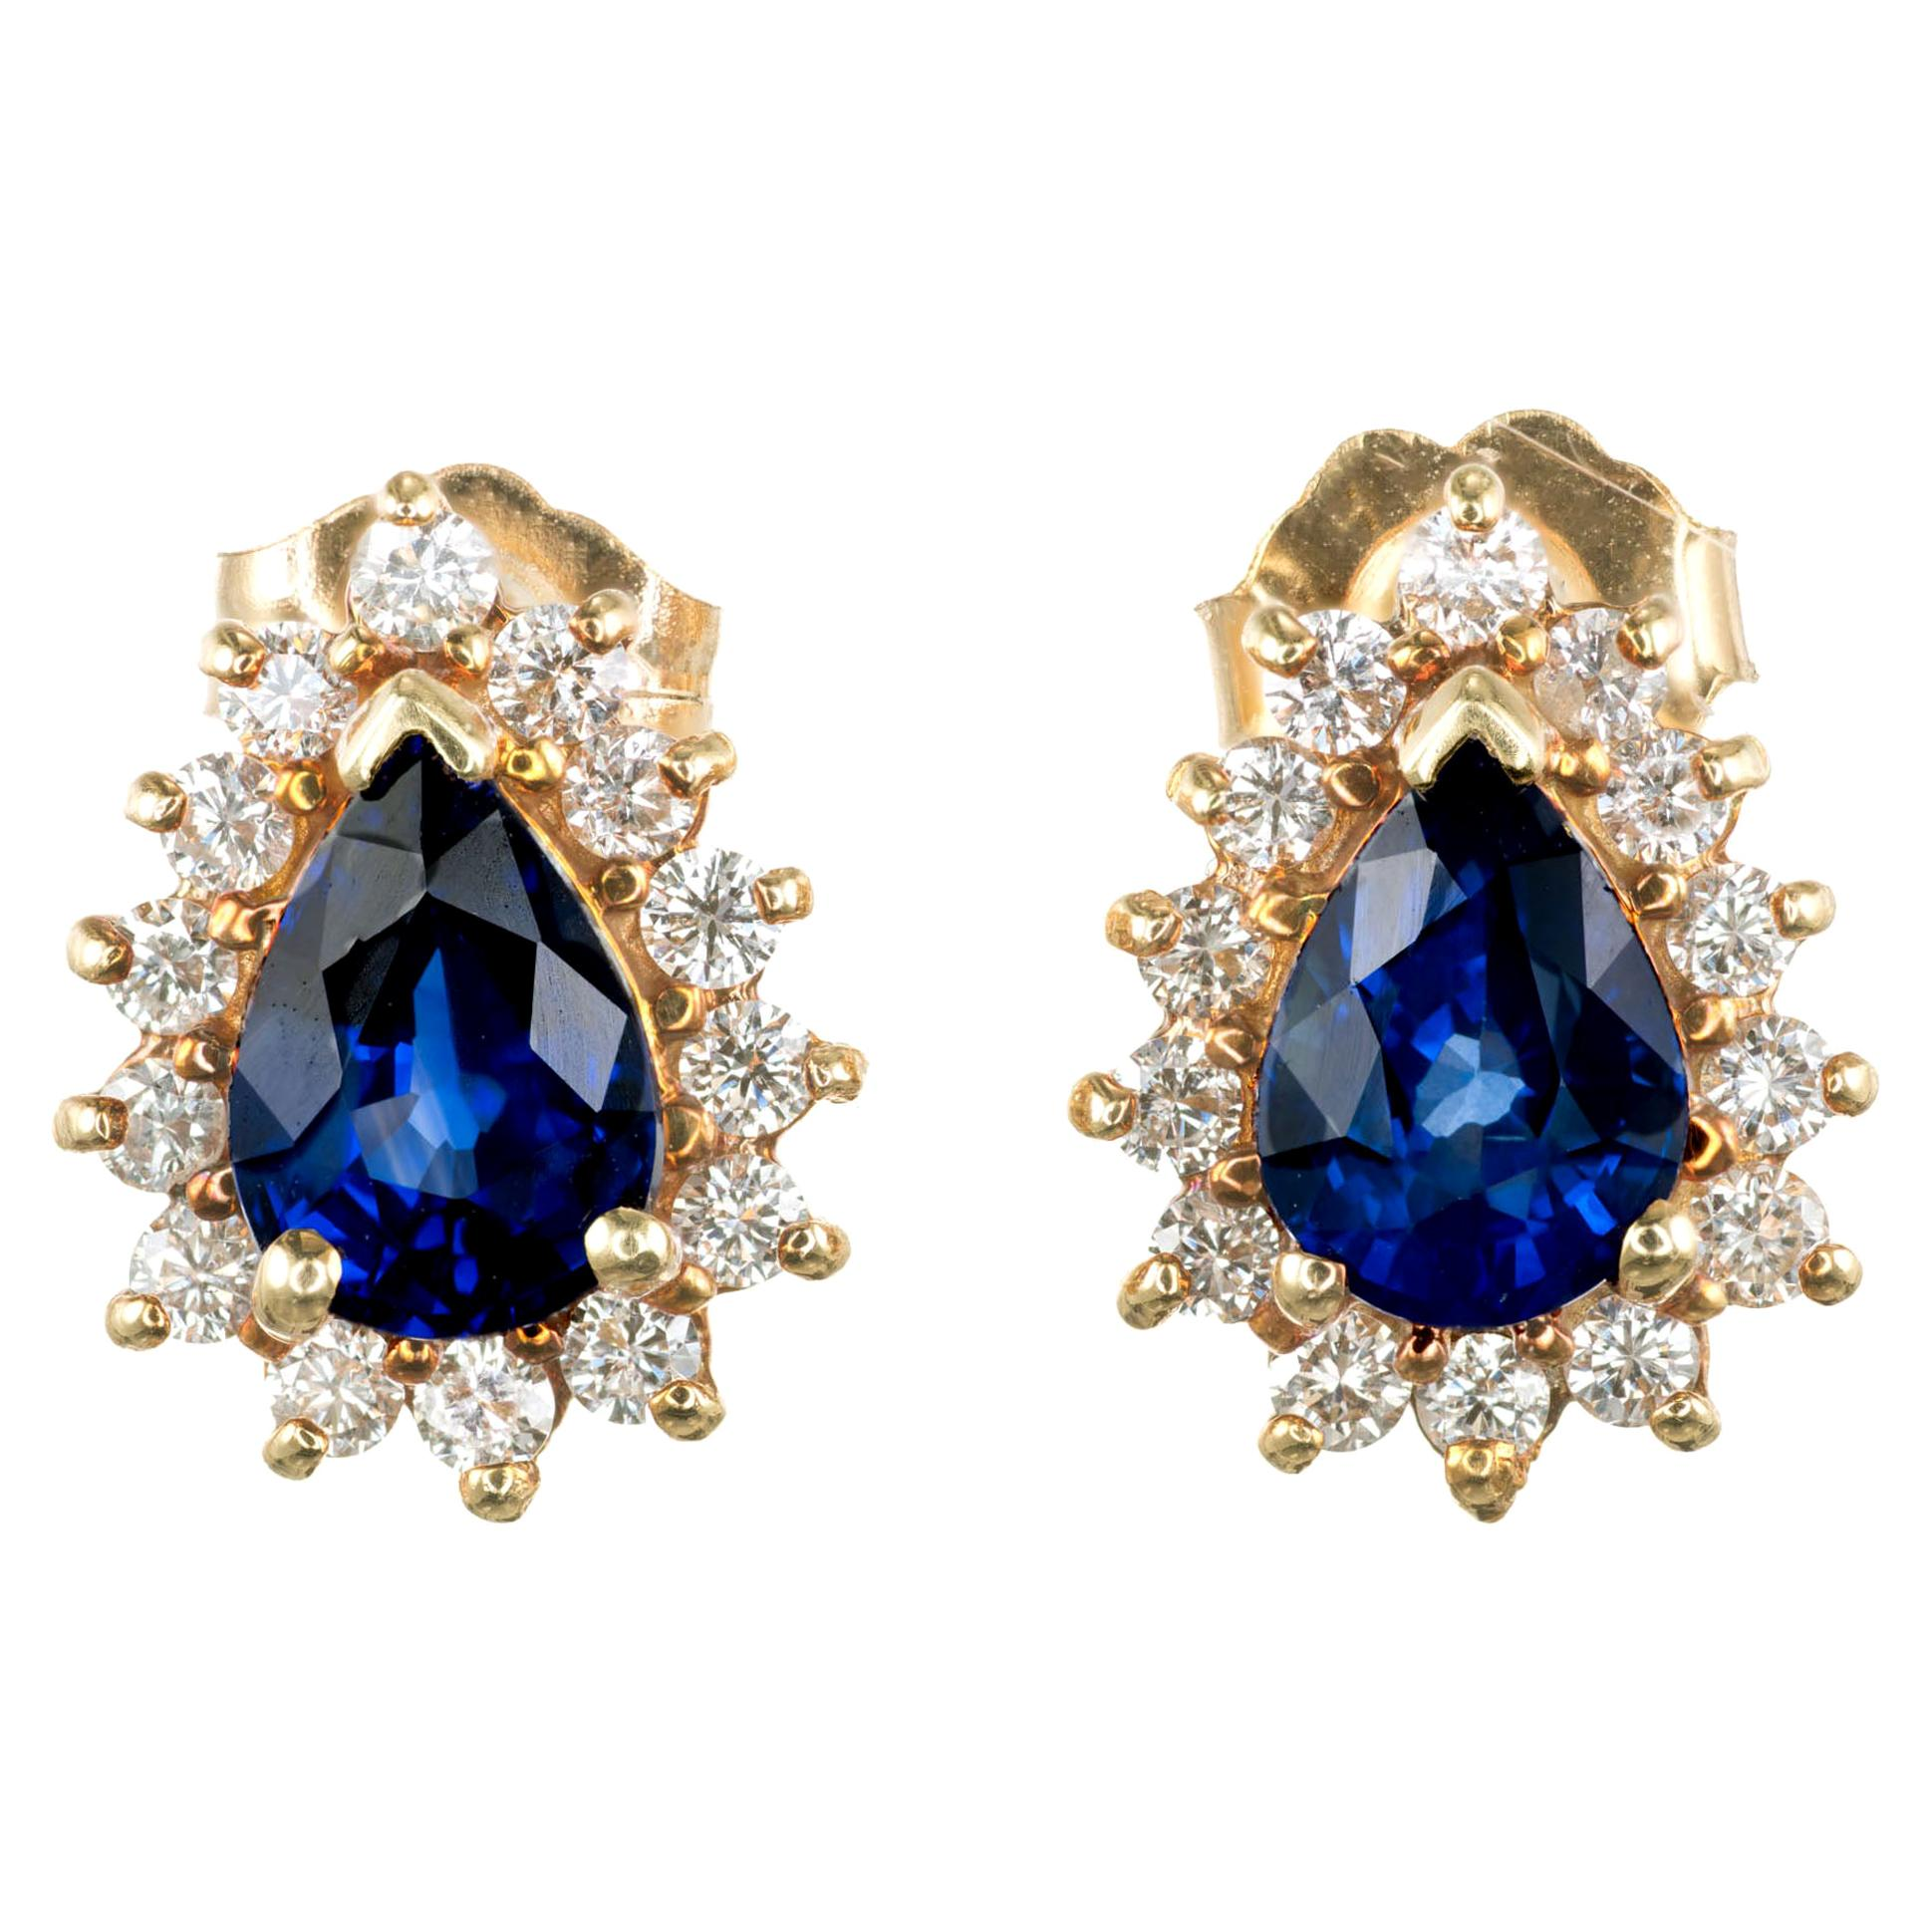 1.50 Carat Blue Pear Sapphire Diamond Halo Earrings